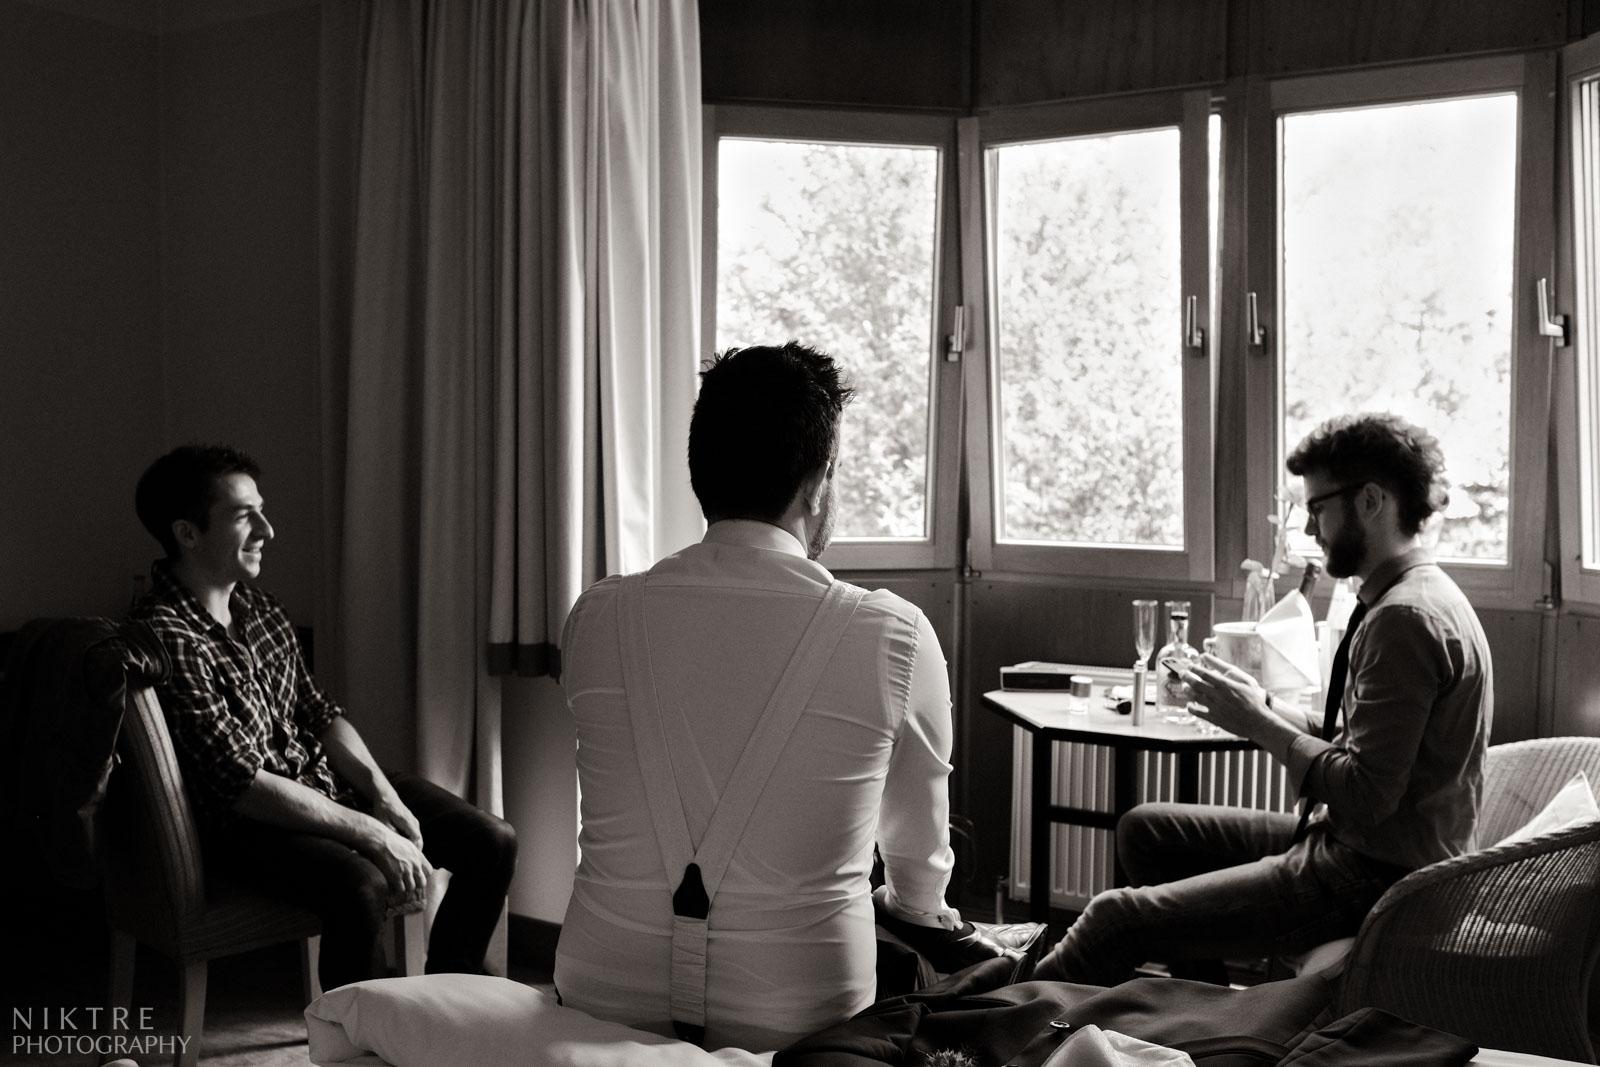 Bräutigam im Freundeskreis bei zwangloser Atmosphäre